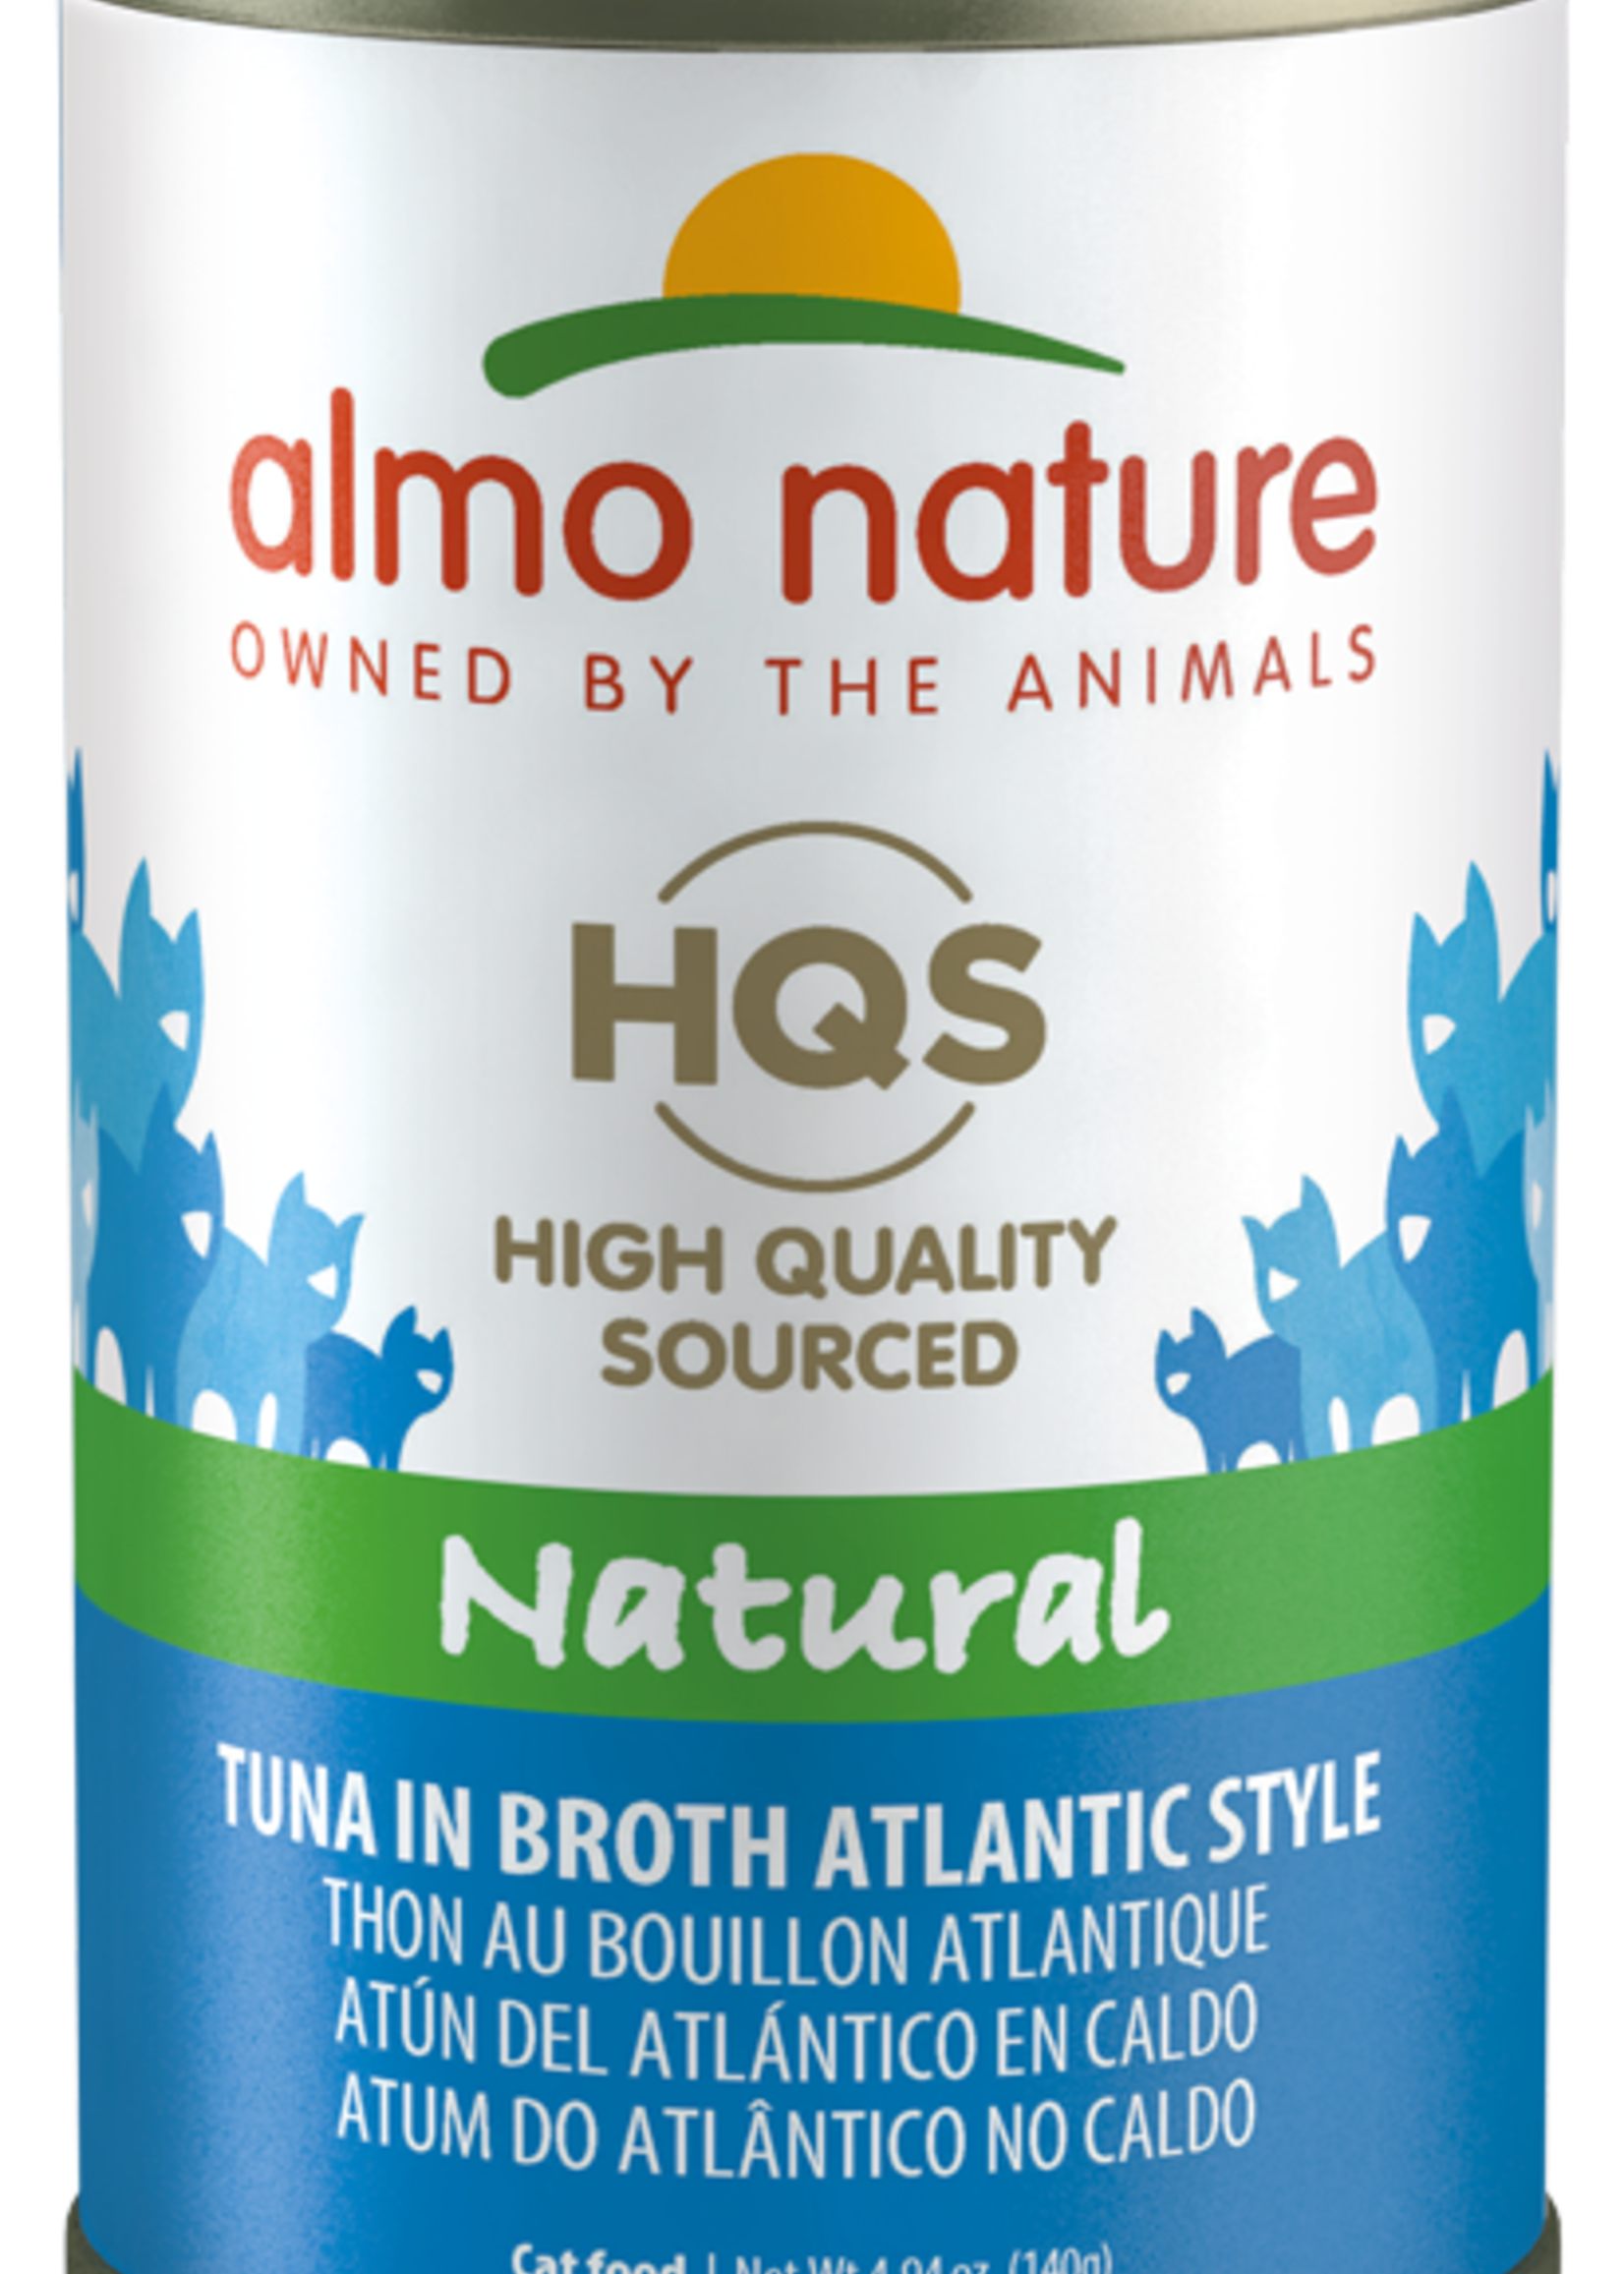 Almo Nature© Almo Nature HQS Natural Tuna in Broth Atlantic Style 140g